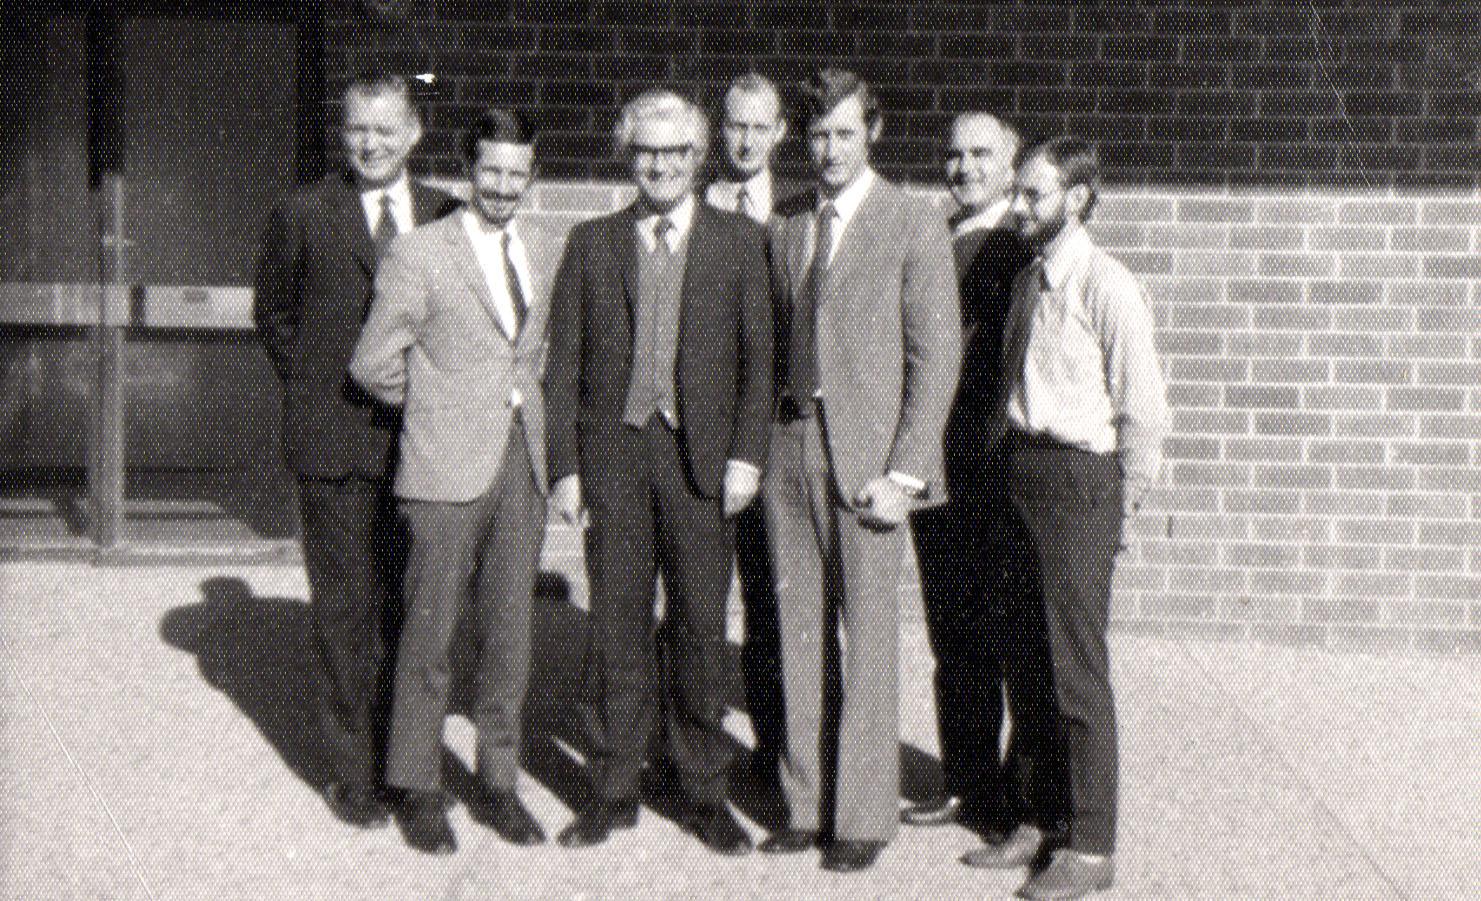 28._Creation_of_the_ACT_Teachers_Federation_1972.jpg